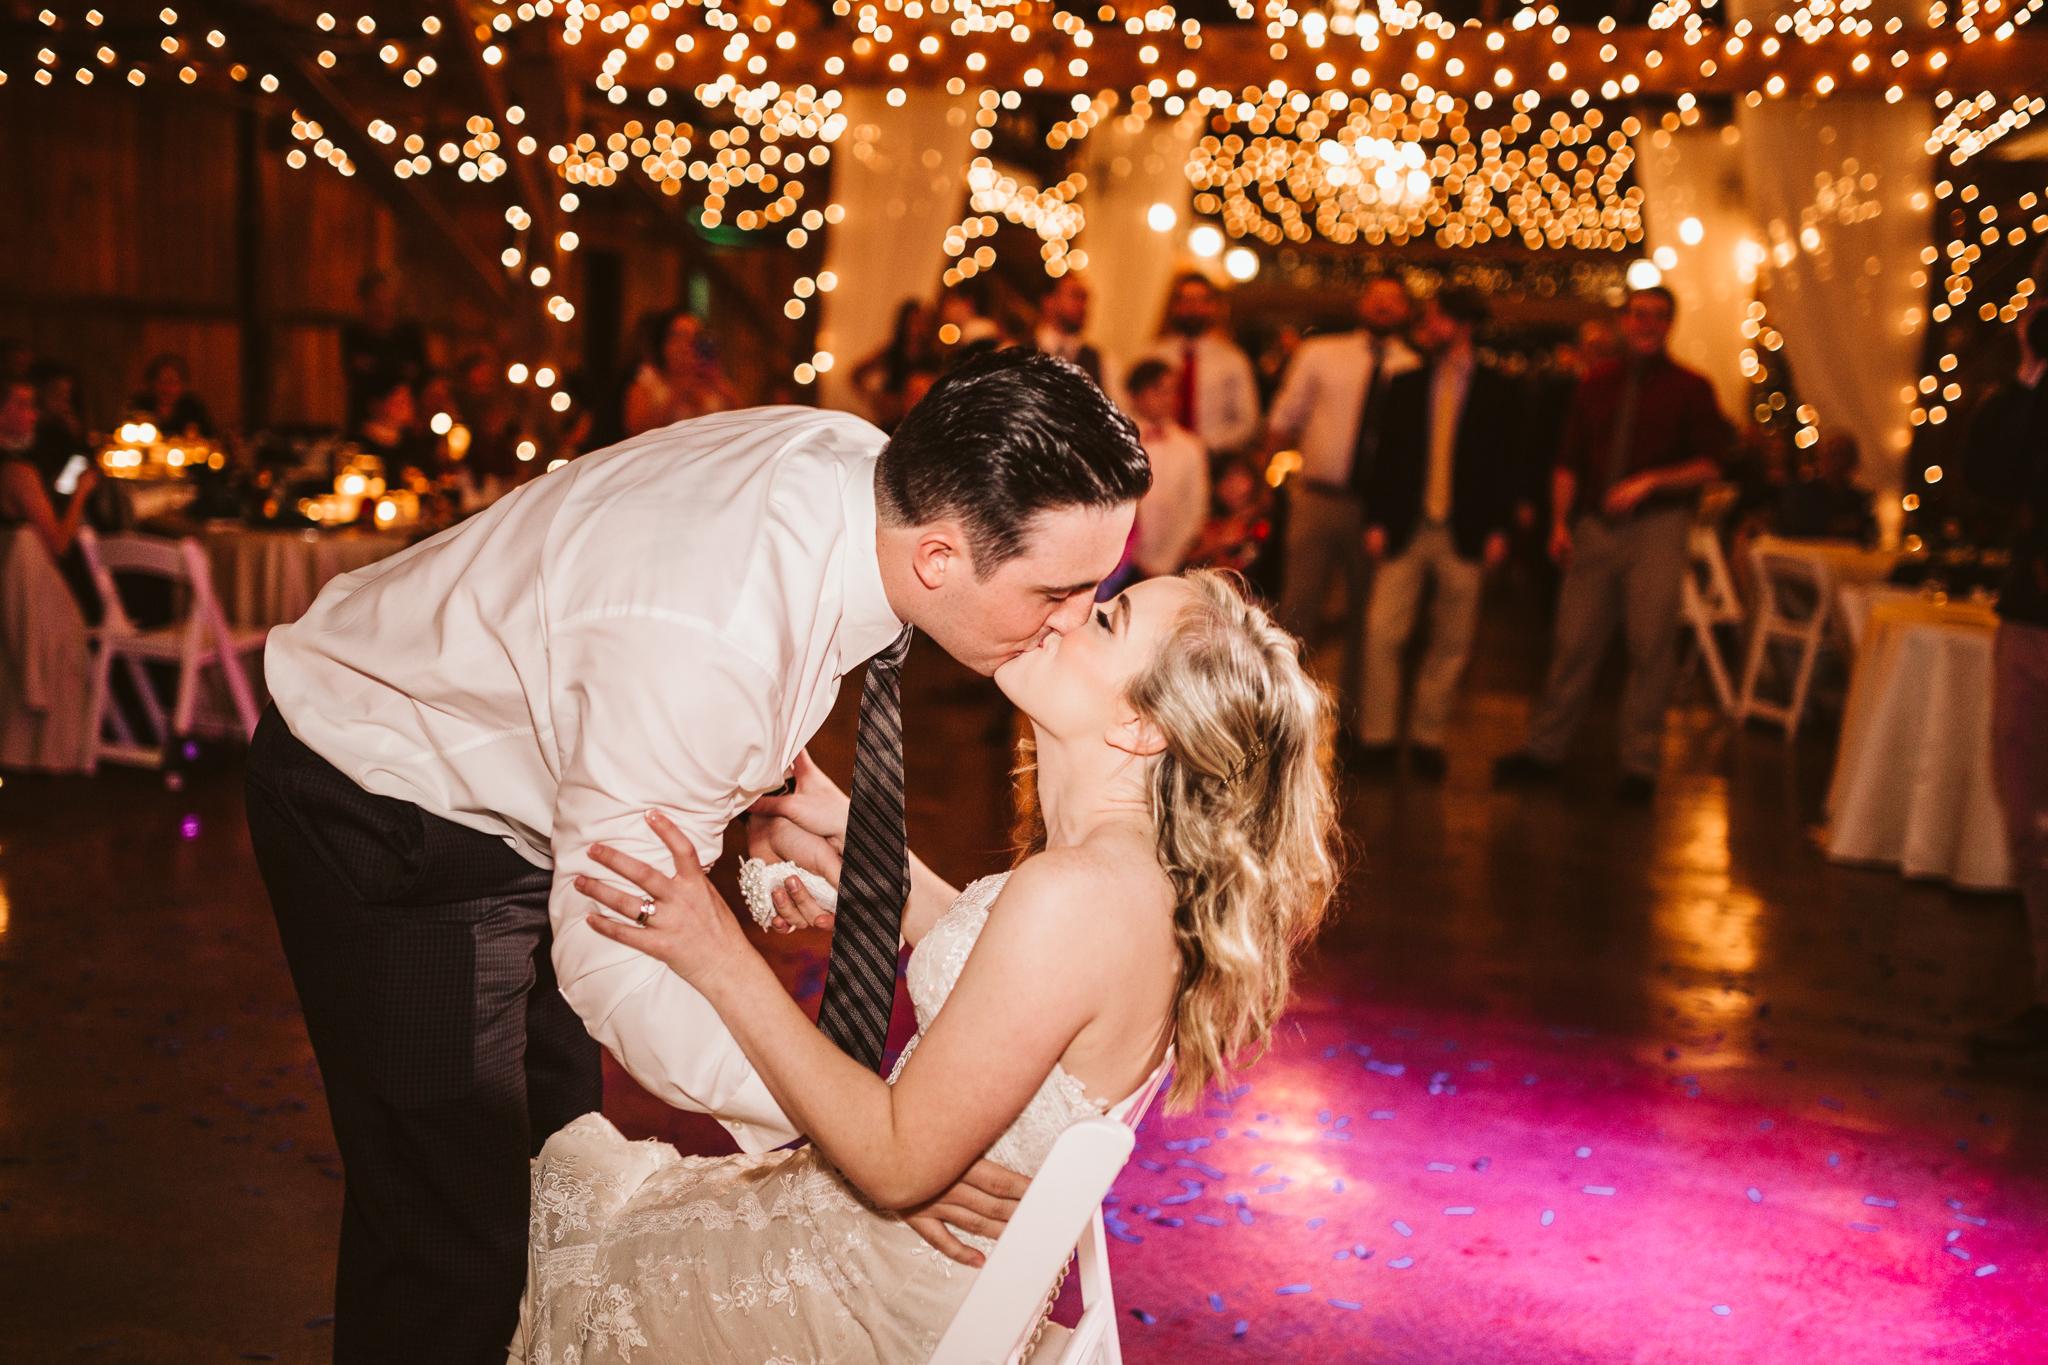 0176 Ariana Jordan Photo - Cameron & Lauren's Wedding at Talon Winery  8256.jpg